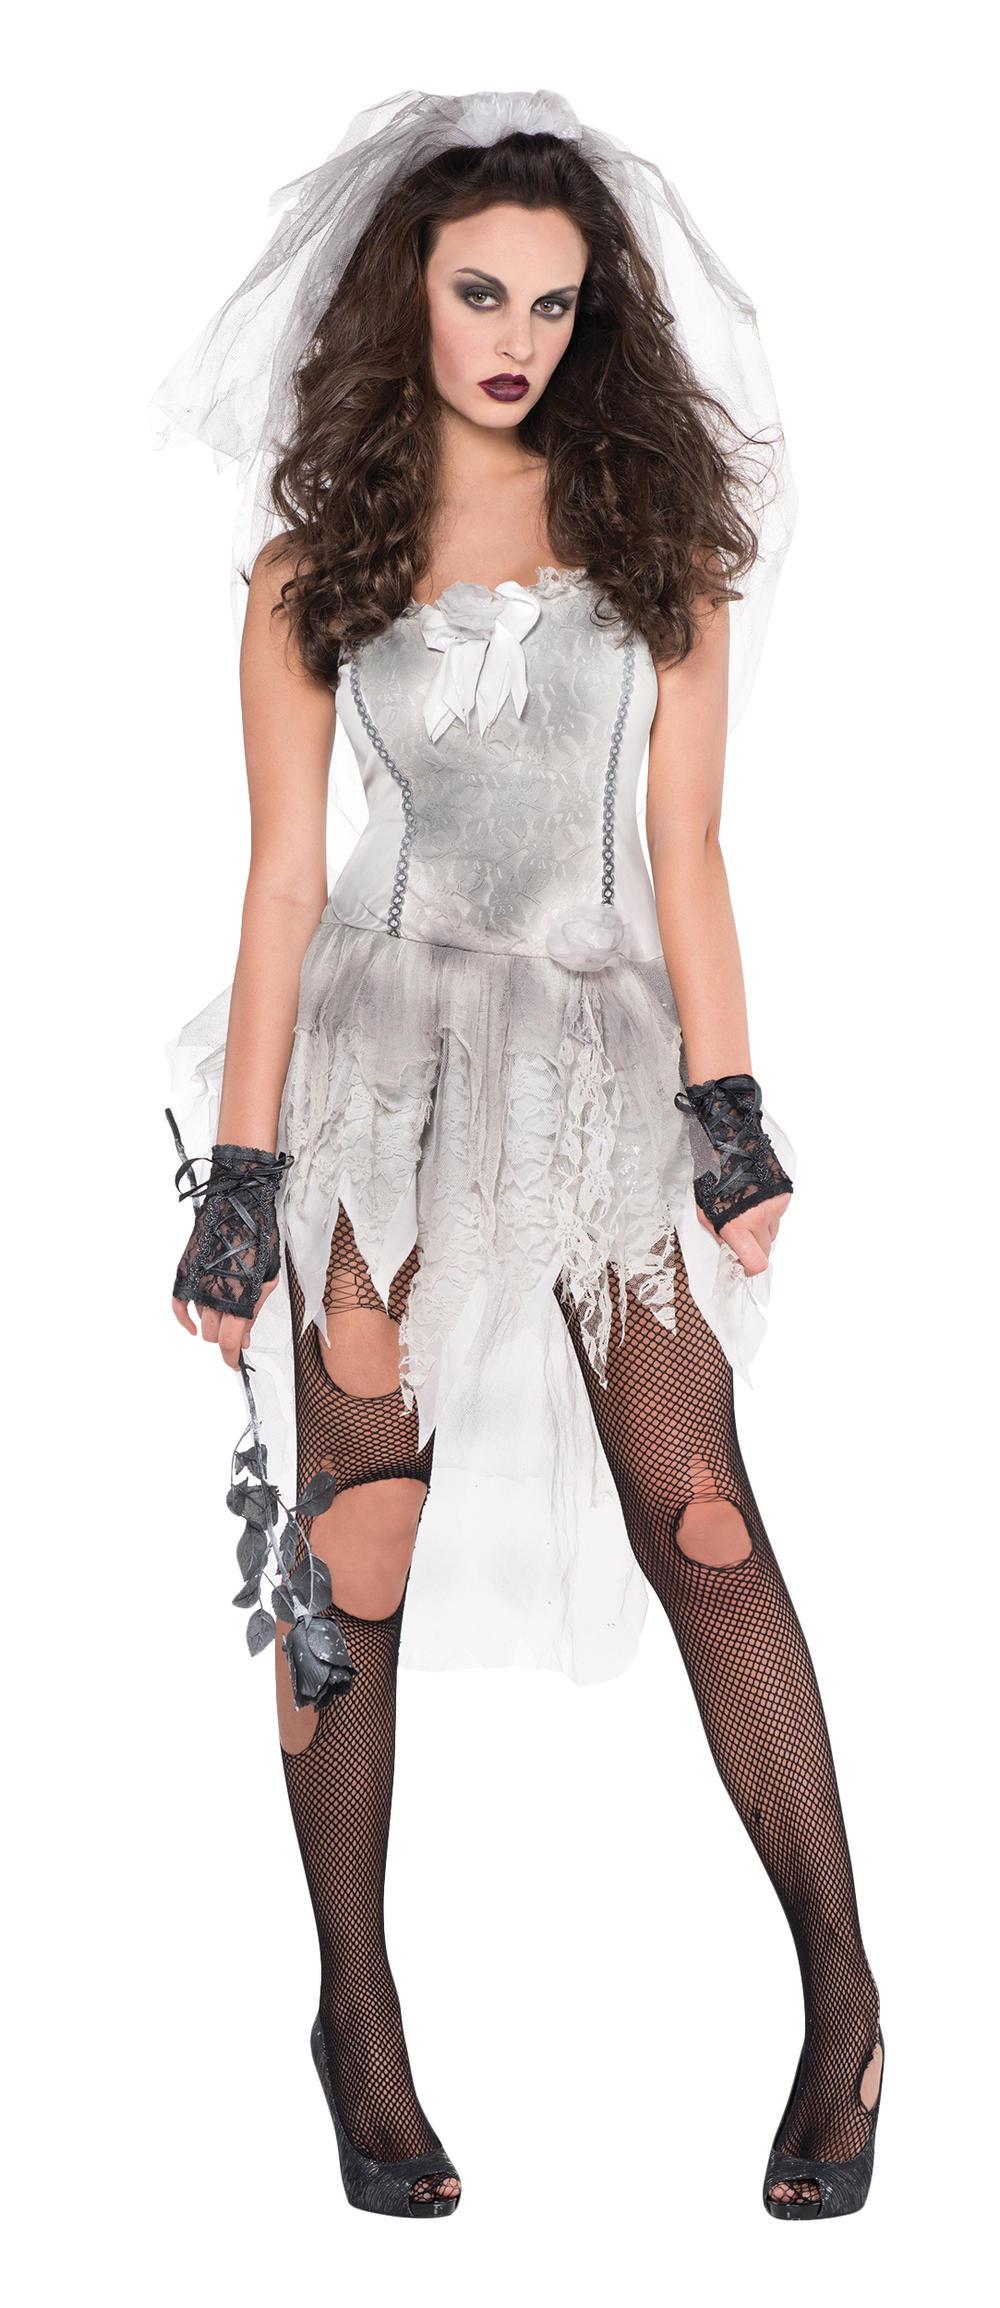 Drop Dead Zombie Bride Ladies Fancy Dress Halloween Wedding Adult Costume Outfit